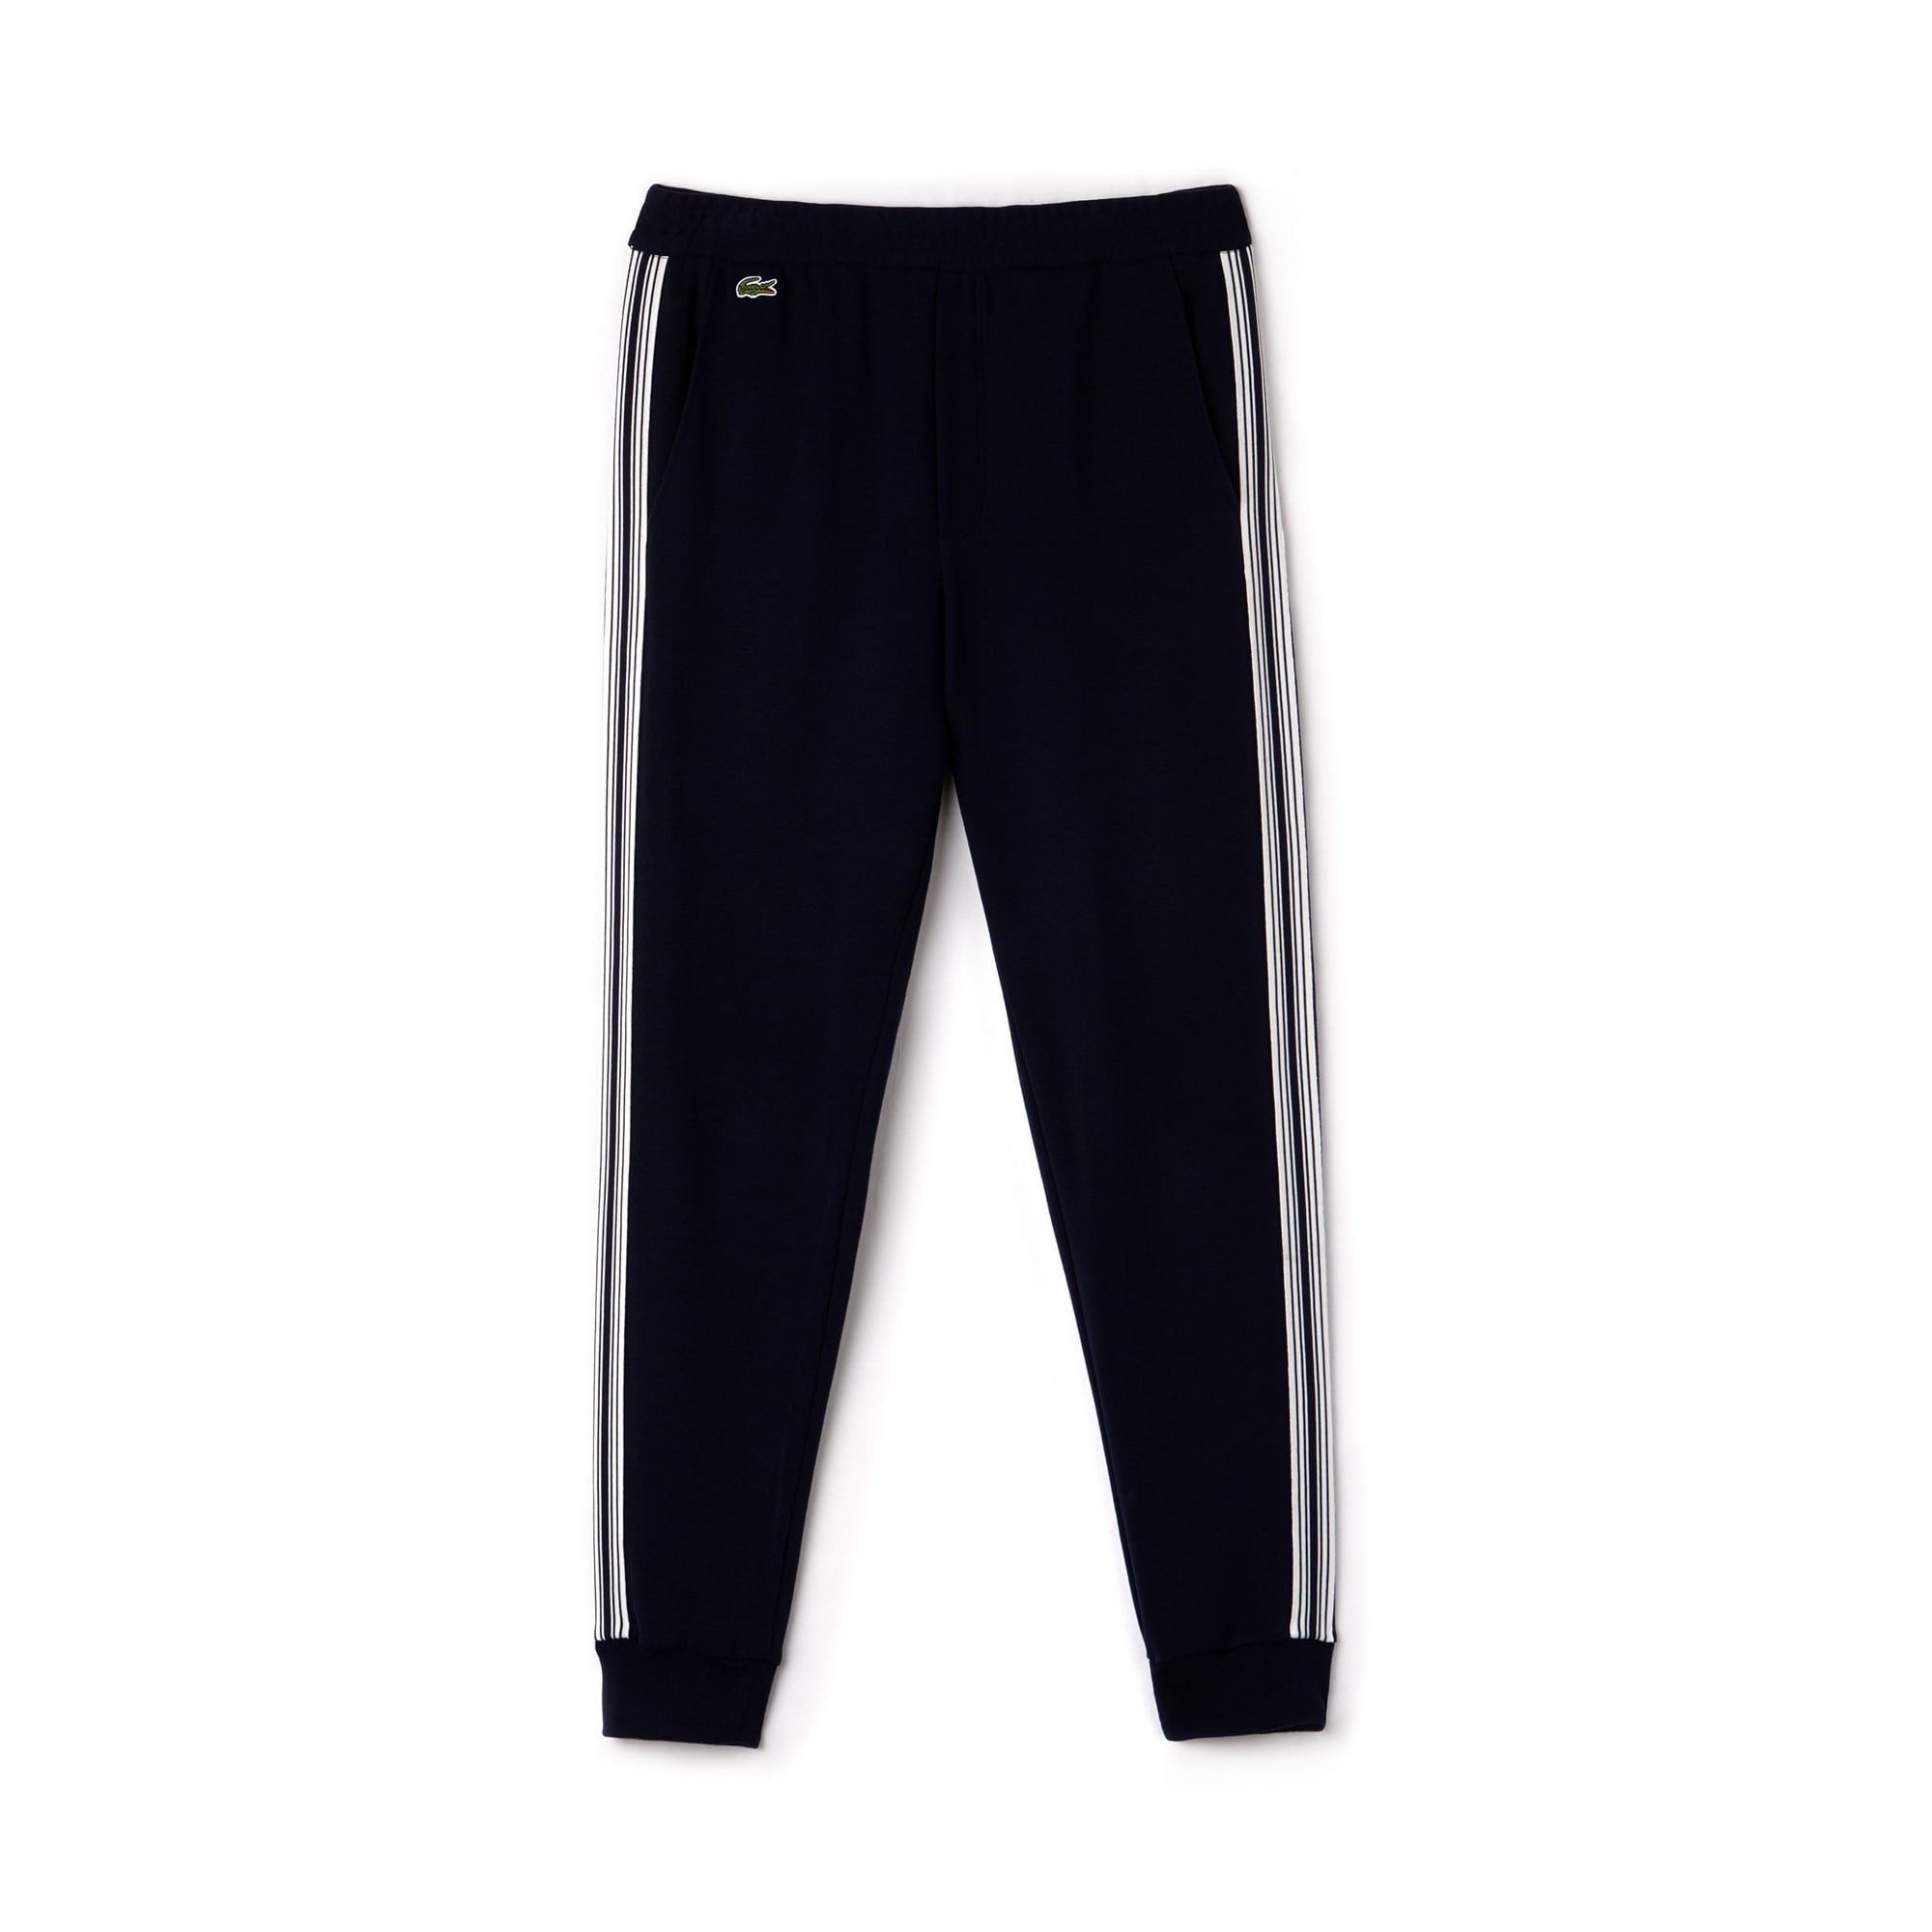 Men's Contrast Bands Milano Cotton Urban Jogging Pants